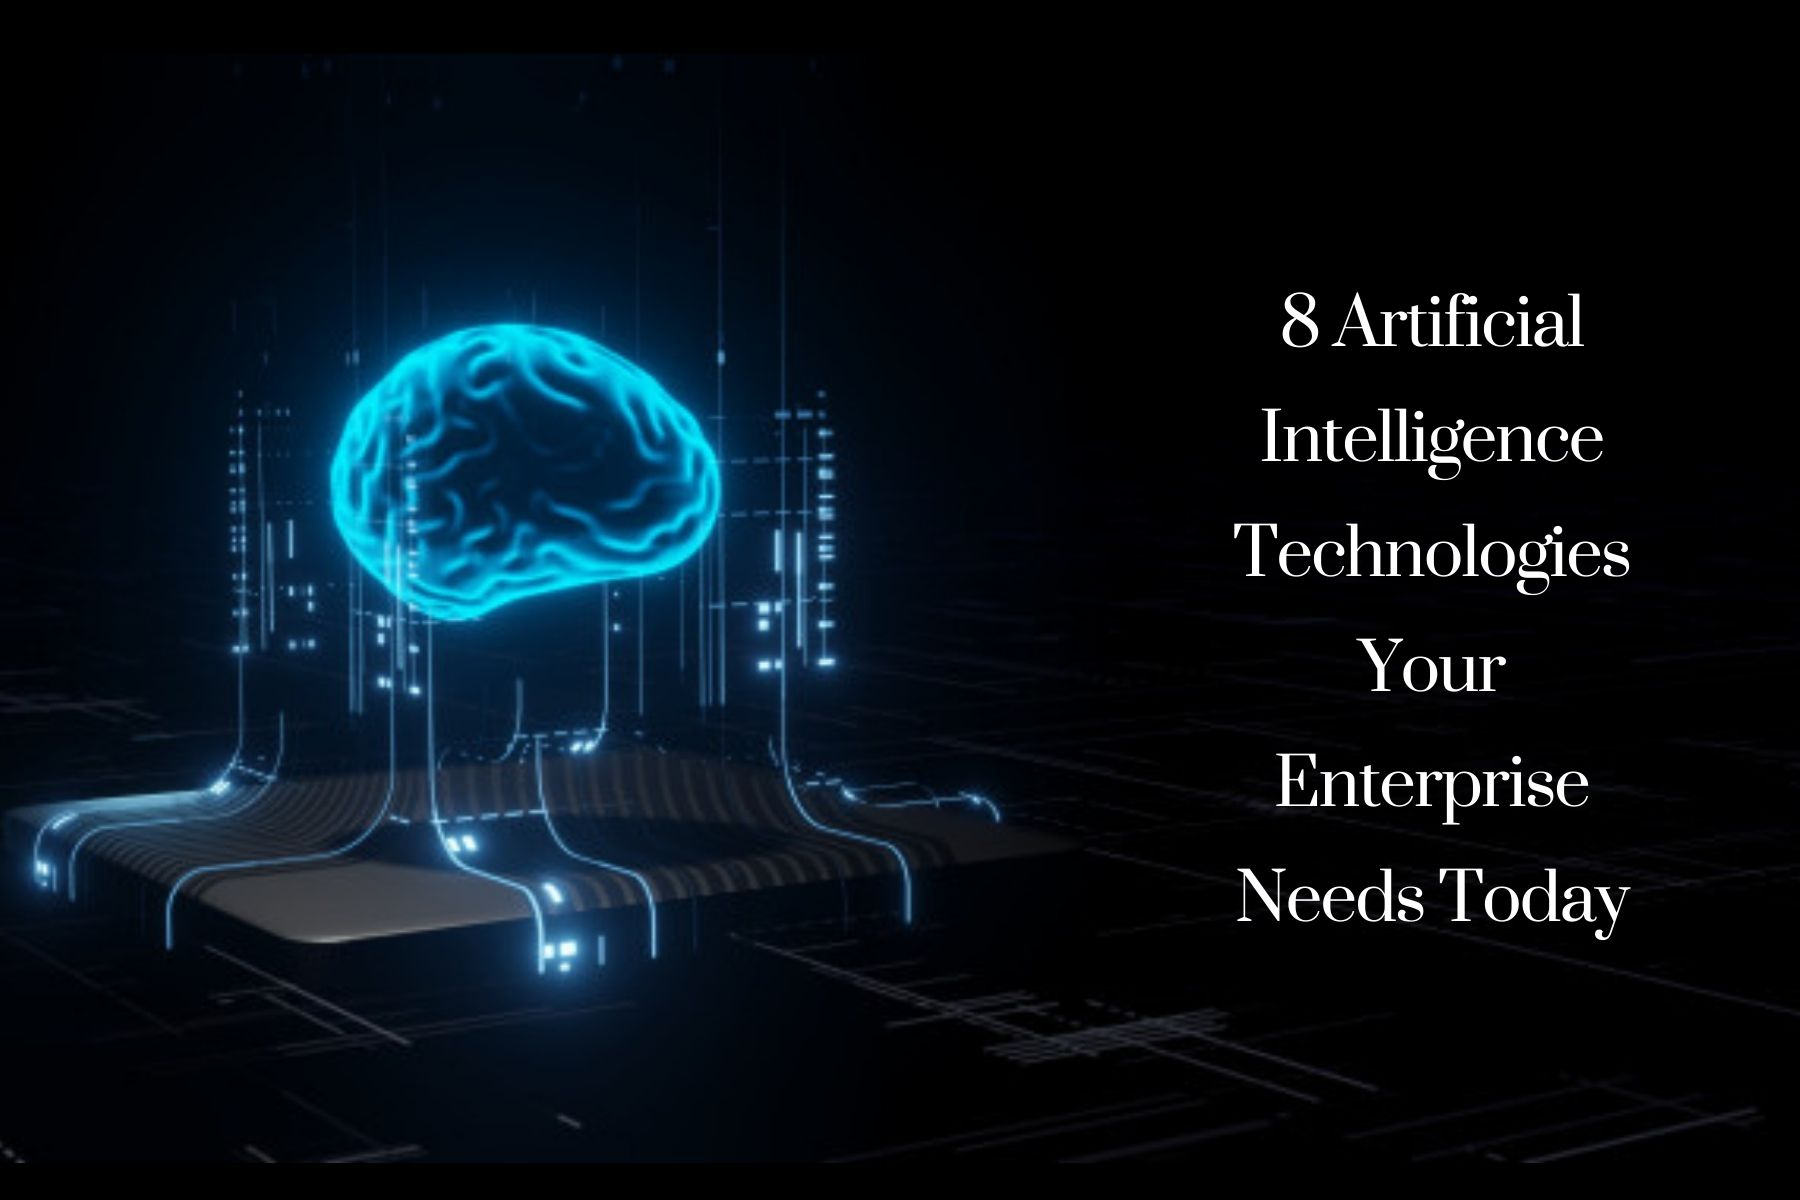 Artificial intelligence technolgies